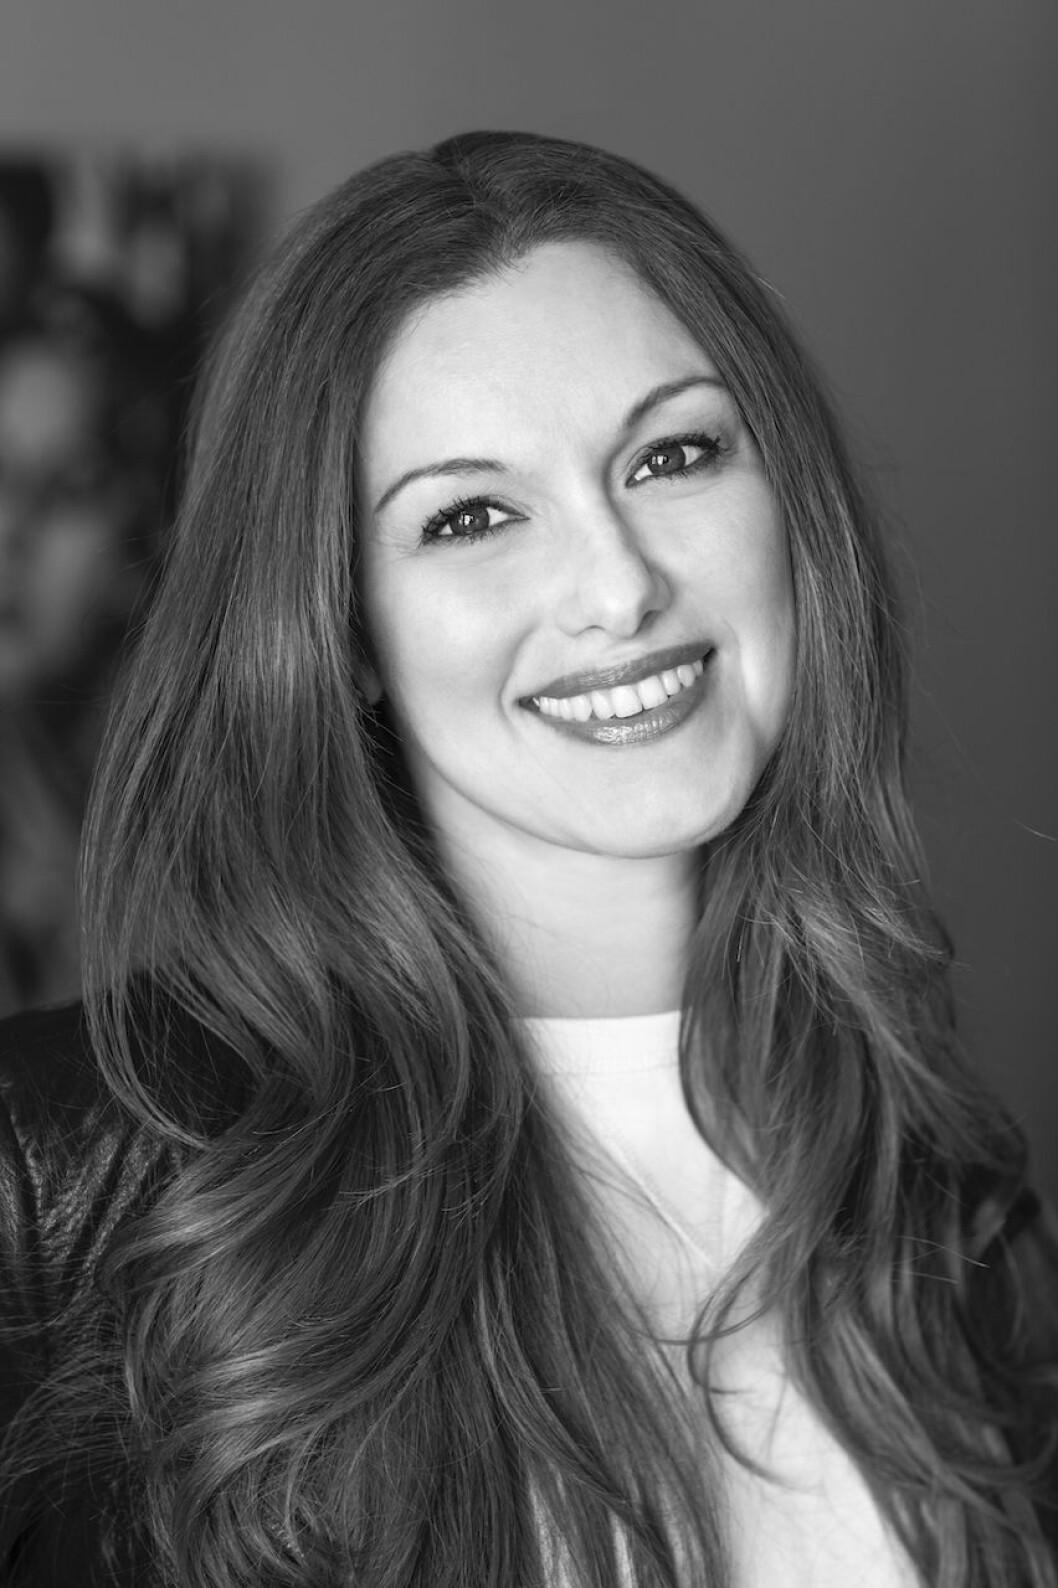 Paulina Draganja flytta smart